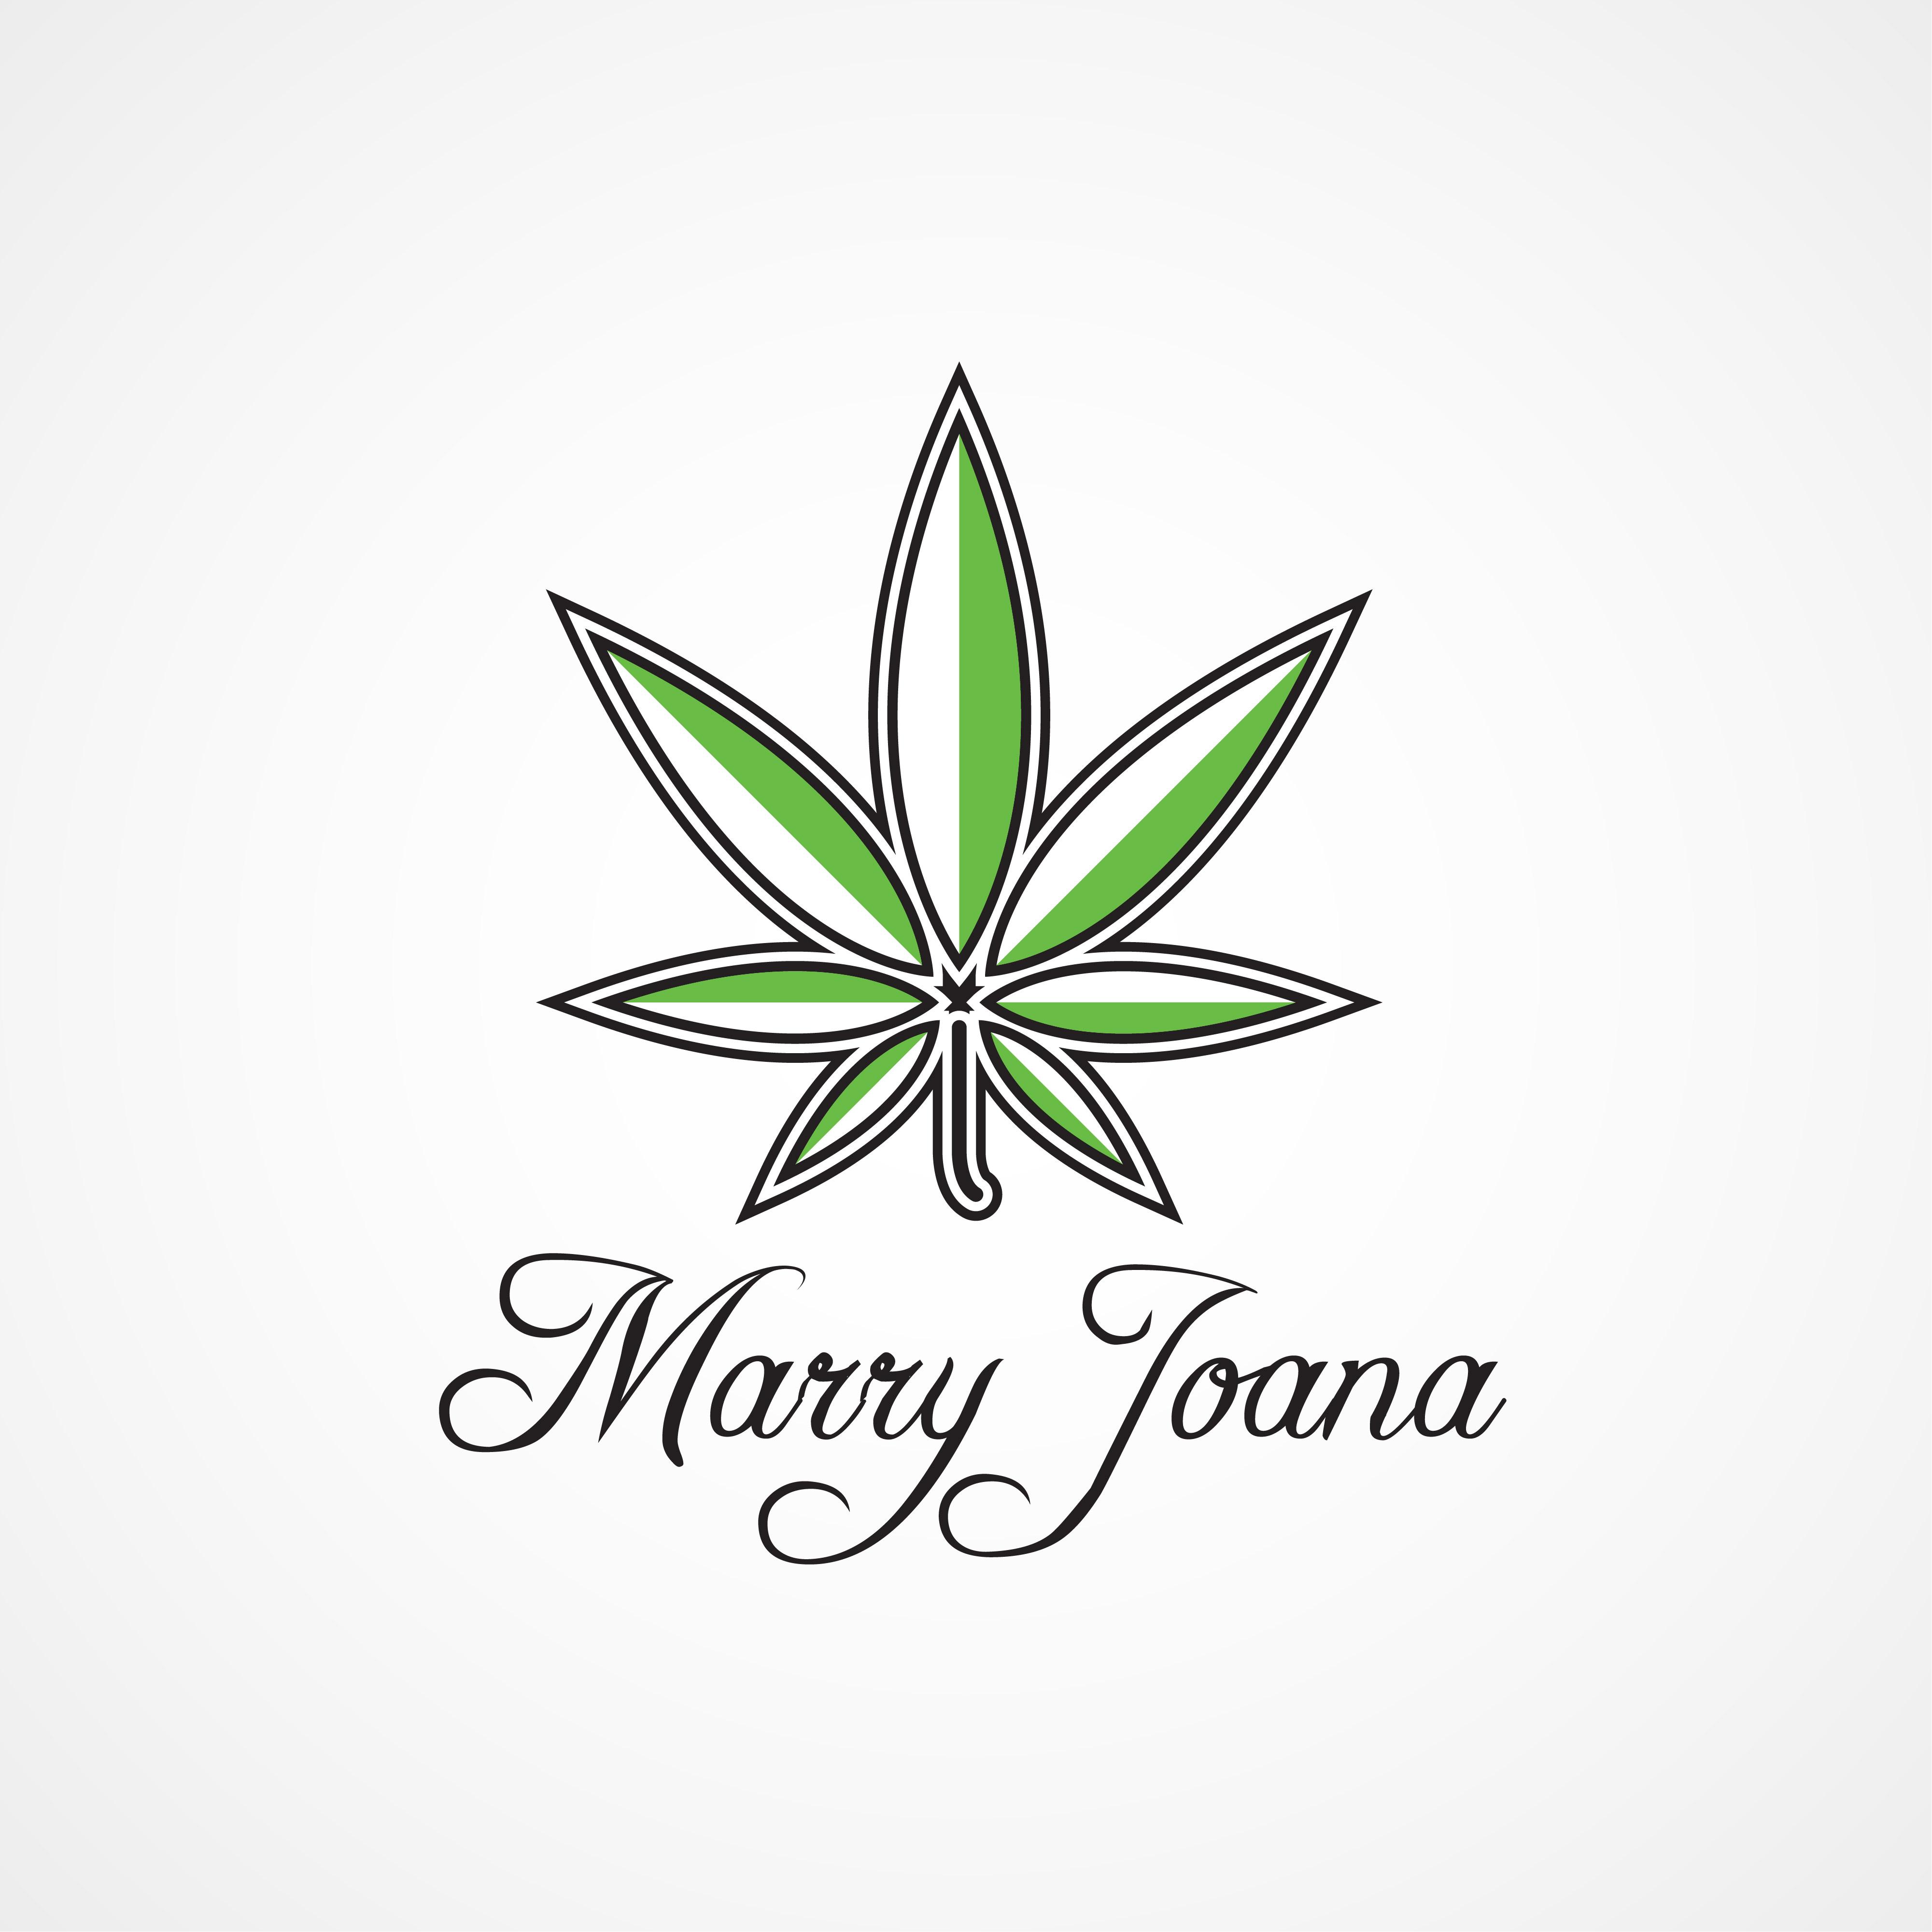 Outline Cannabis Logo 660352 - Download Free Vectors ...